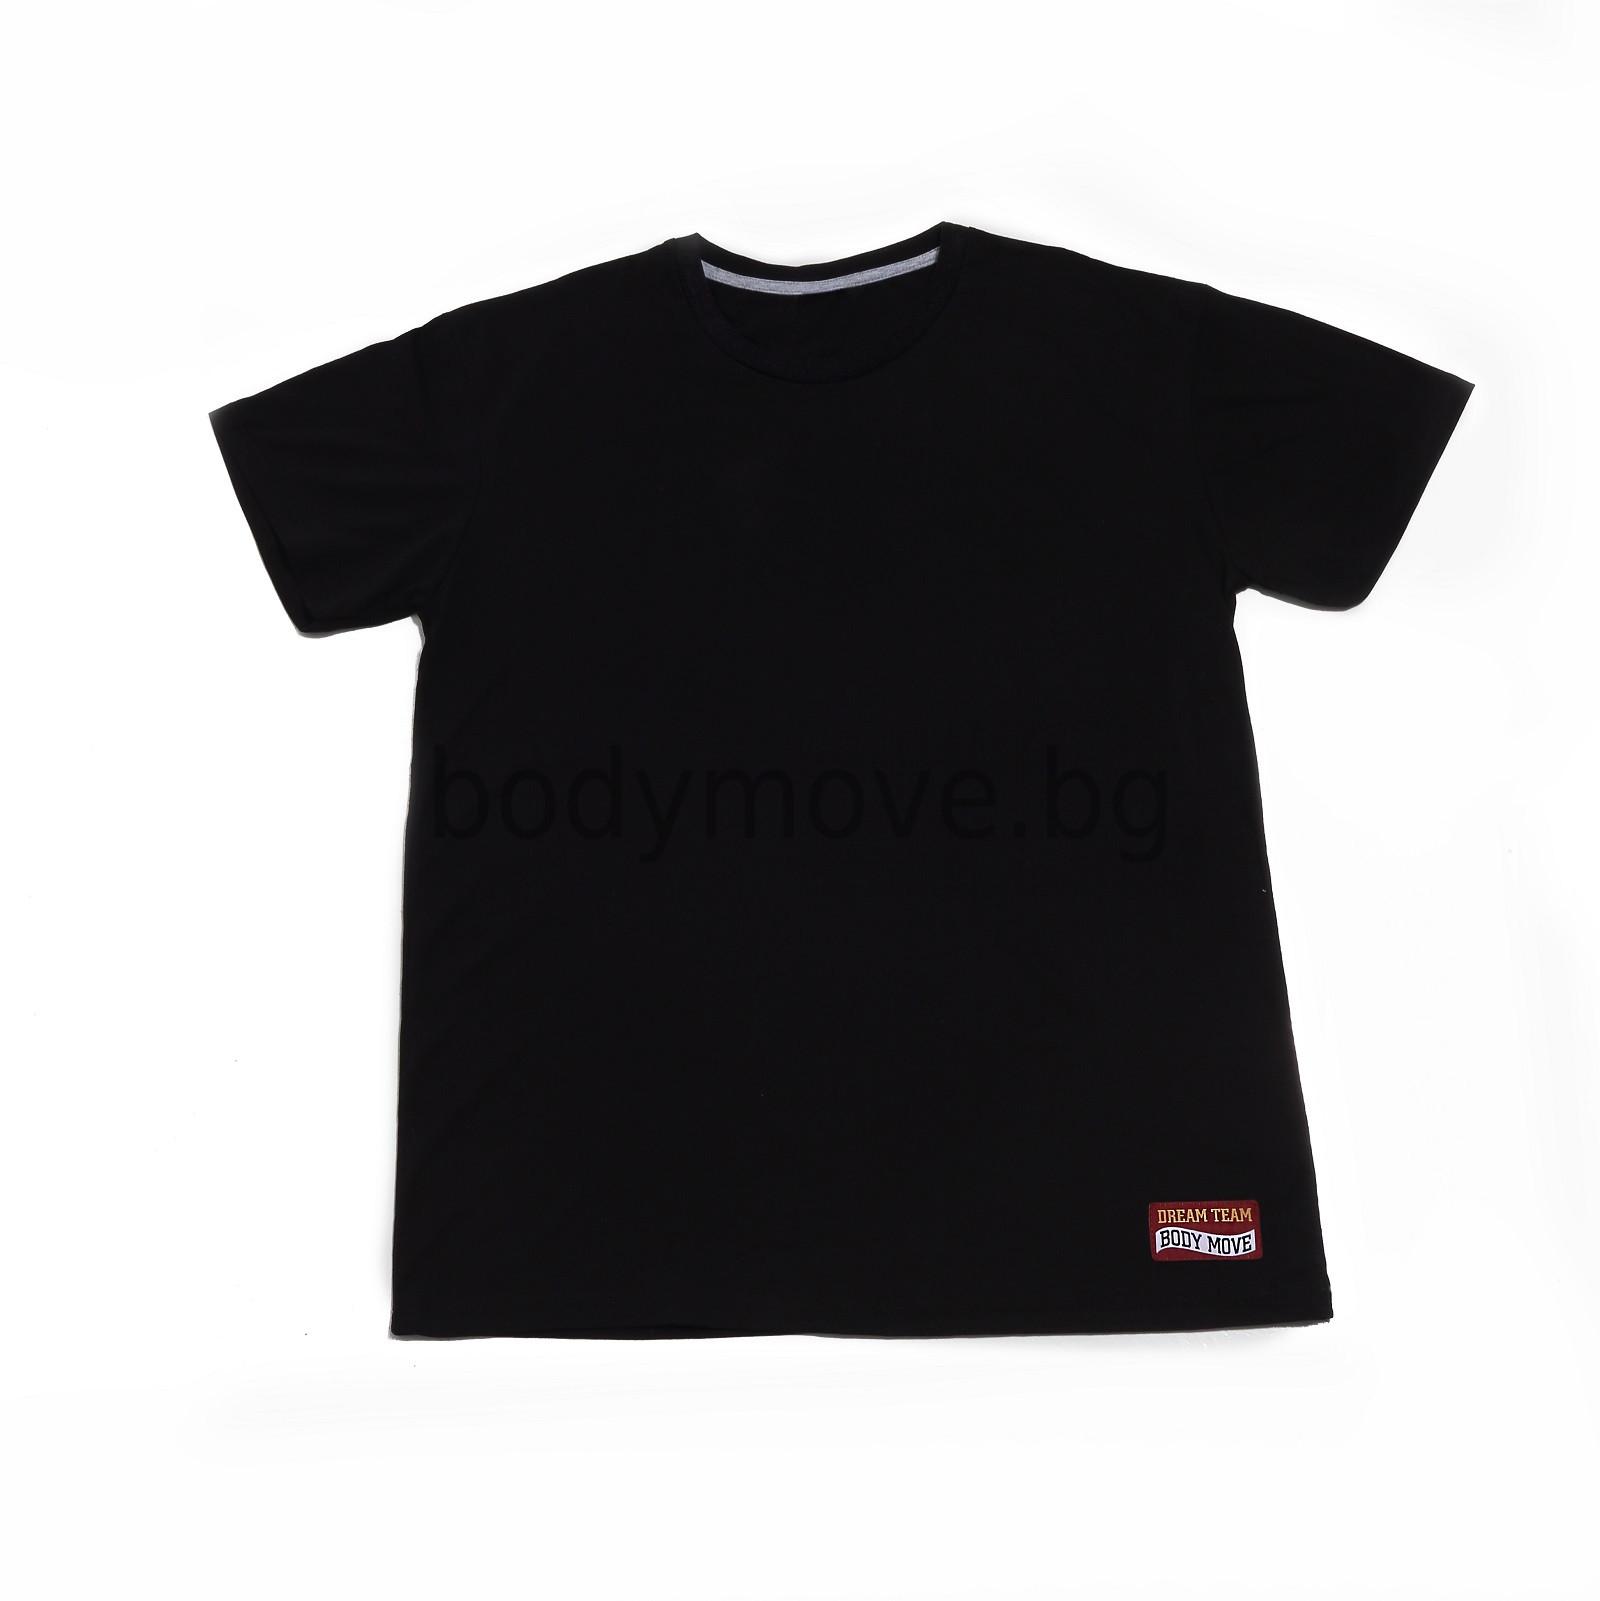 6dd727eb05a3 Αρχική σελίδα   Προϊόντα   Ανδρικά   Μπλούζες   Ανδρικι υπερμεγέθη μπλουζα